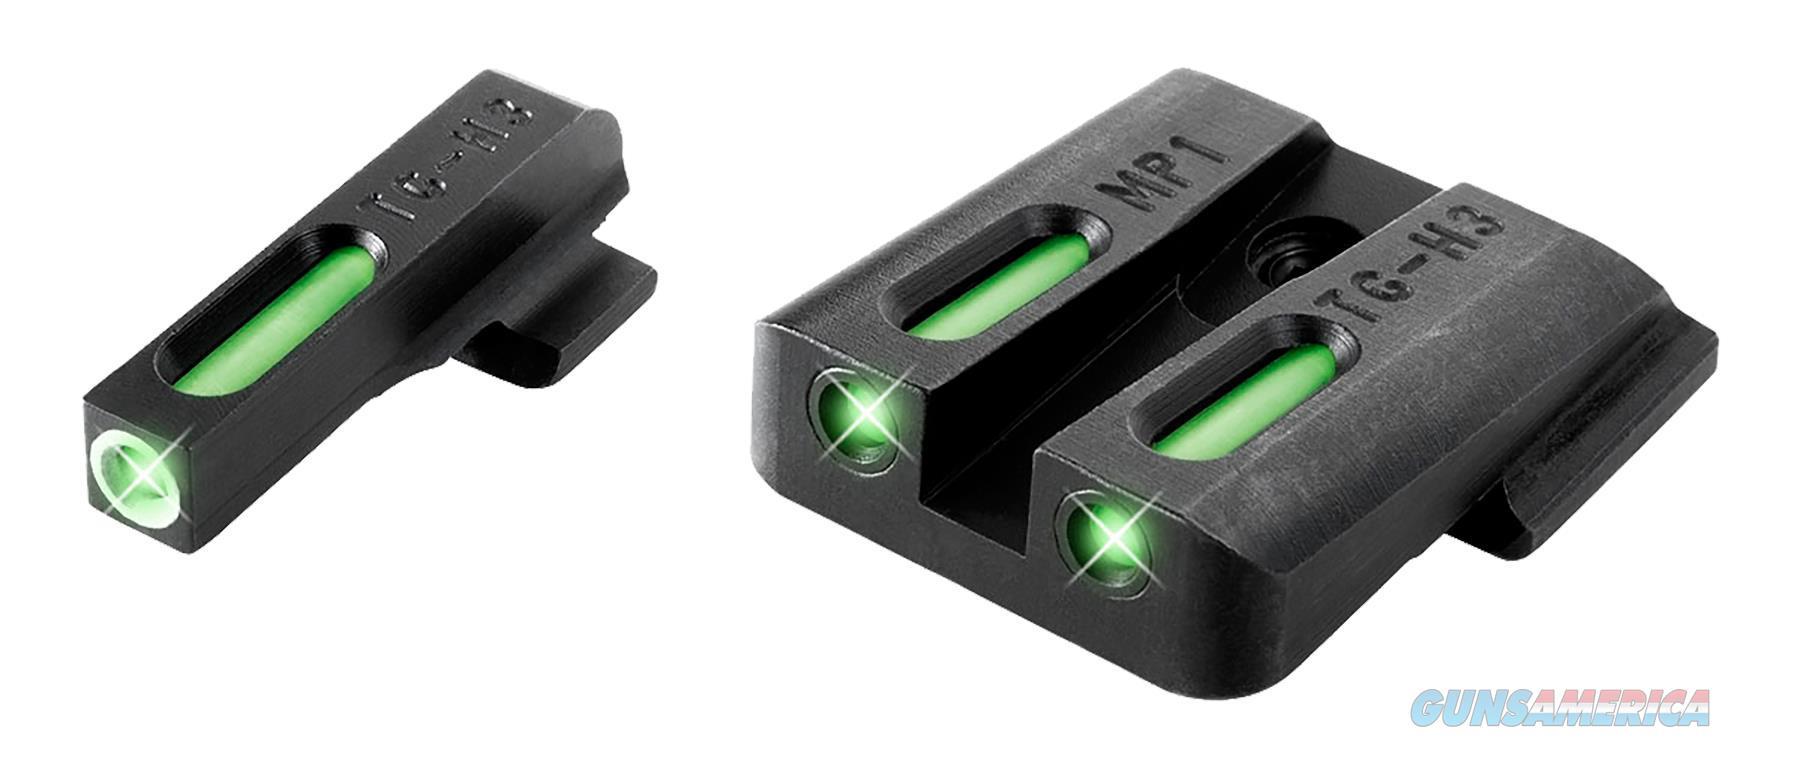 Truglo Tg13mp1a Tfx Day/Nigth Sights S&W M&P Tritium/Fiber Optic Green W/White Outline Front Green Rear Black TG13MP1A  Non-Guns > Iron/Metal/Peep Sights